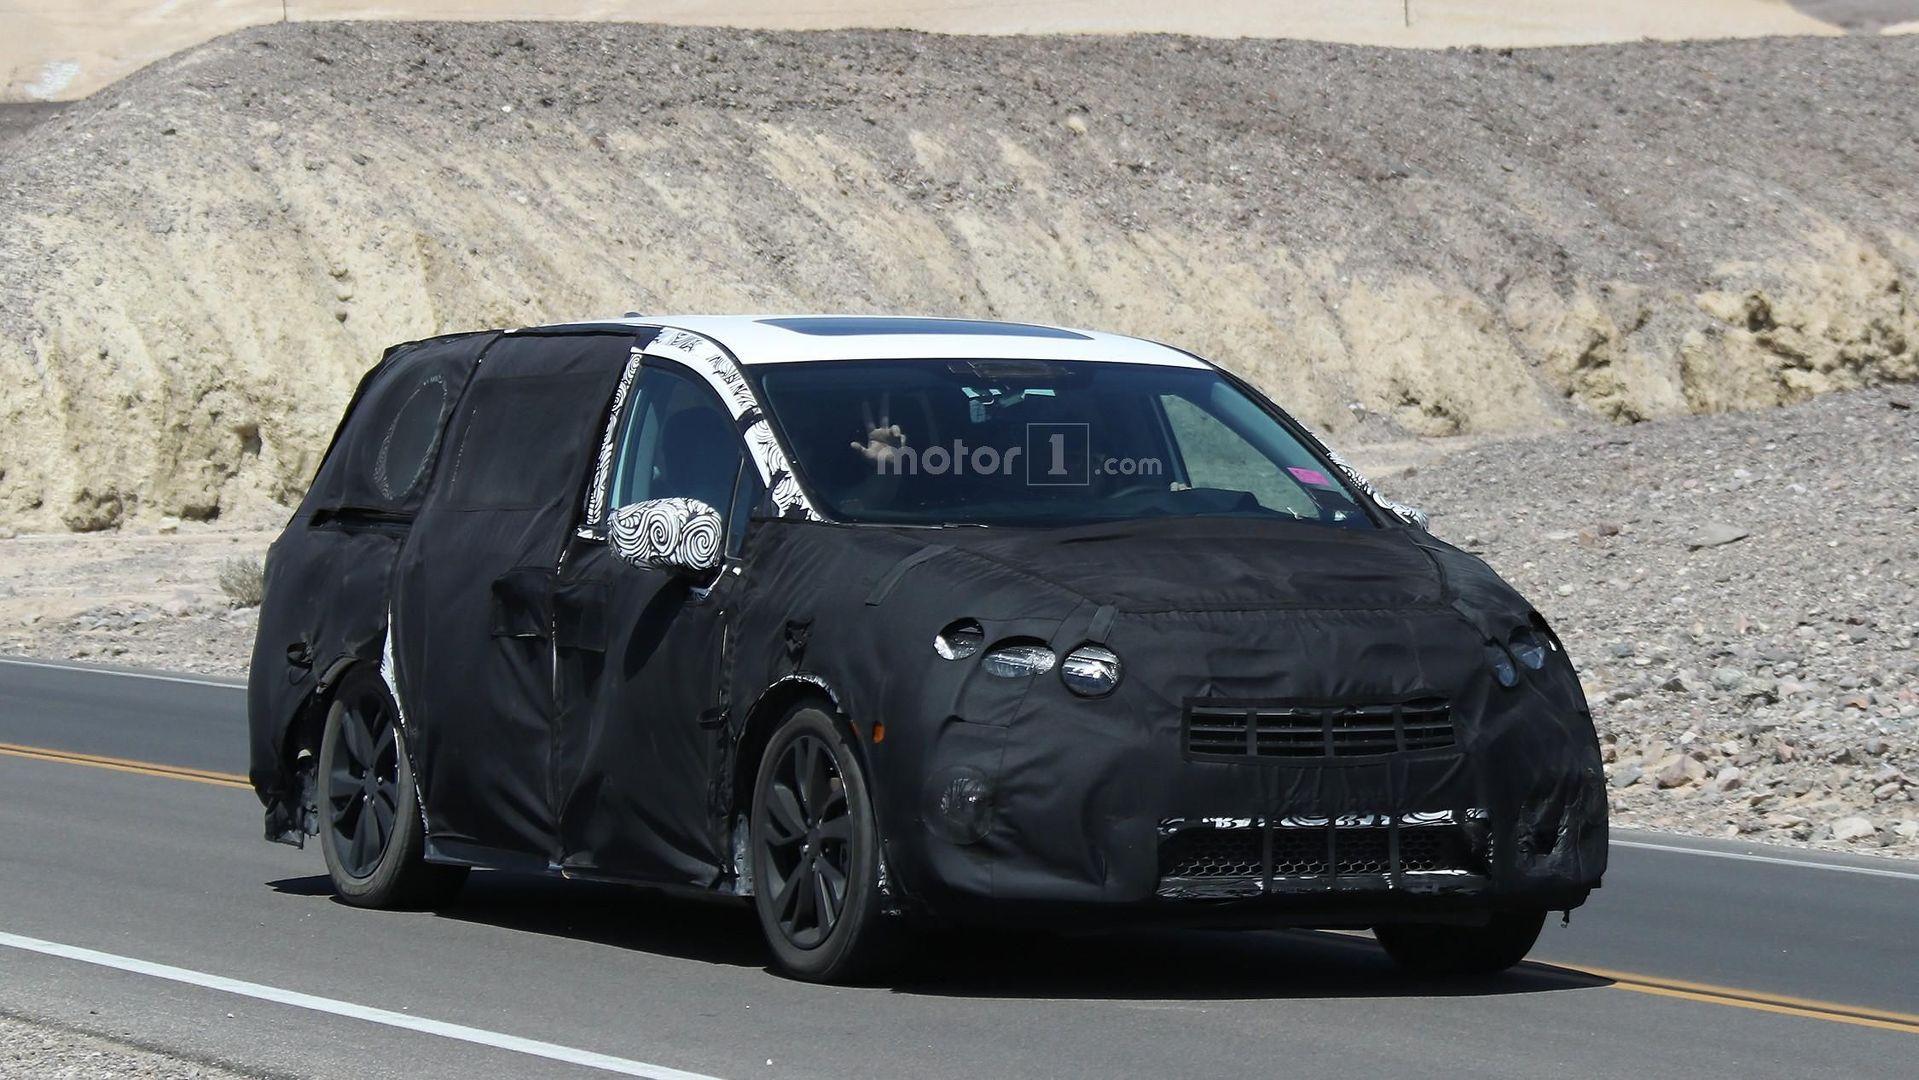 2017 Honda Odyssey Latest News 2017 Honda Odyssey Latest News Concept